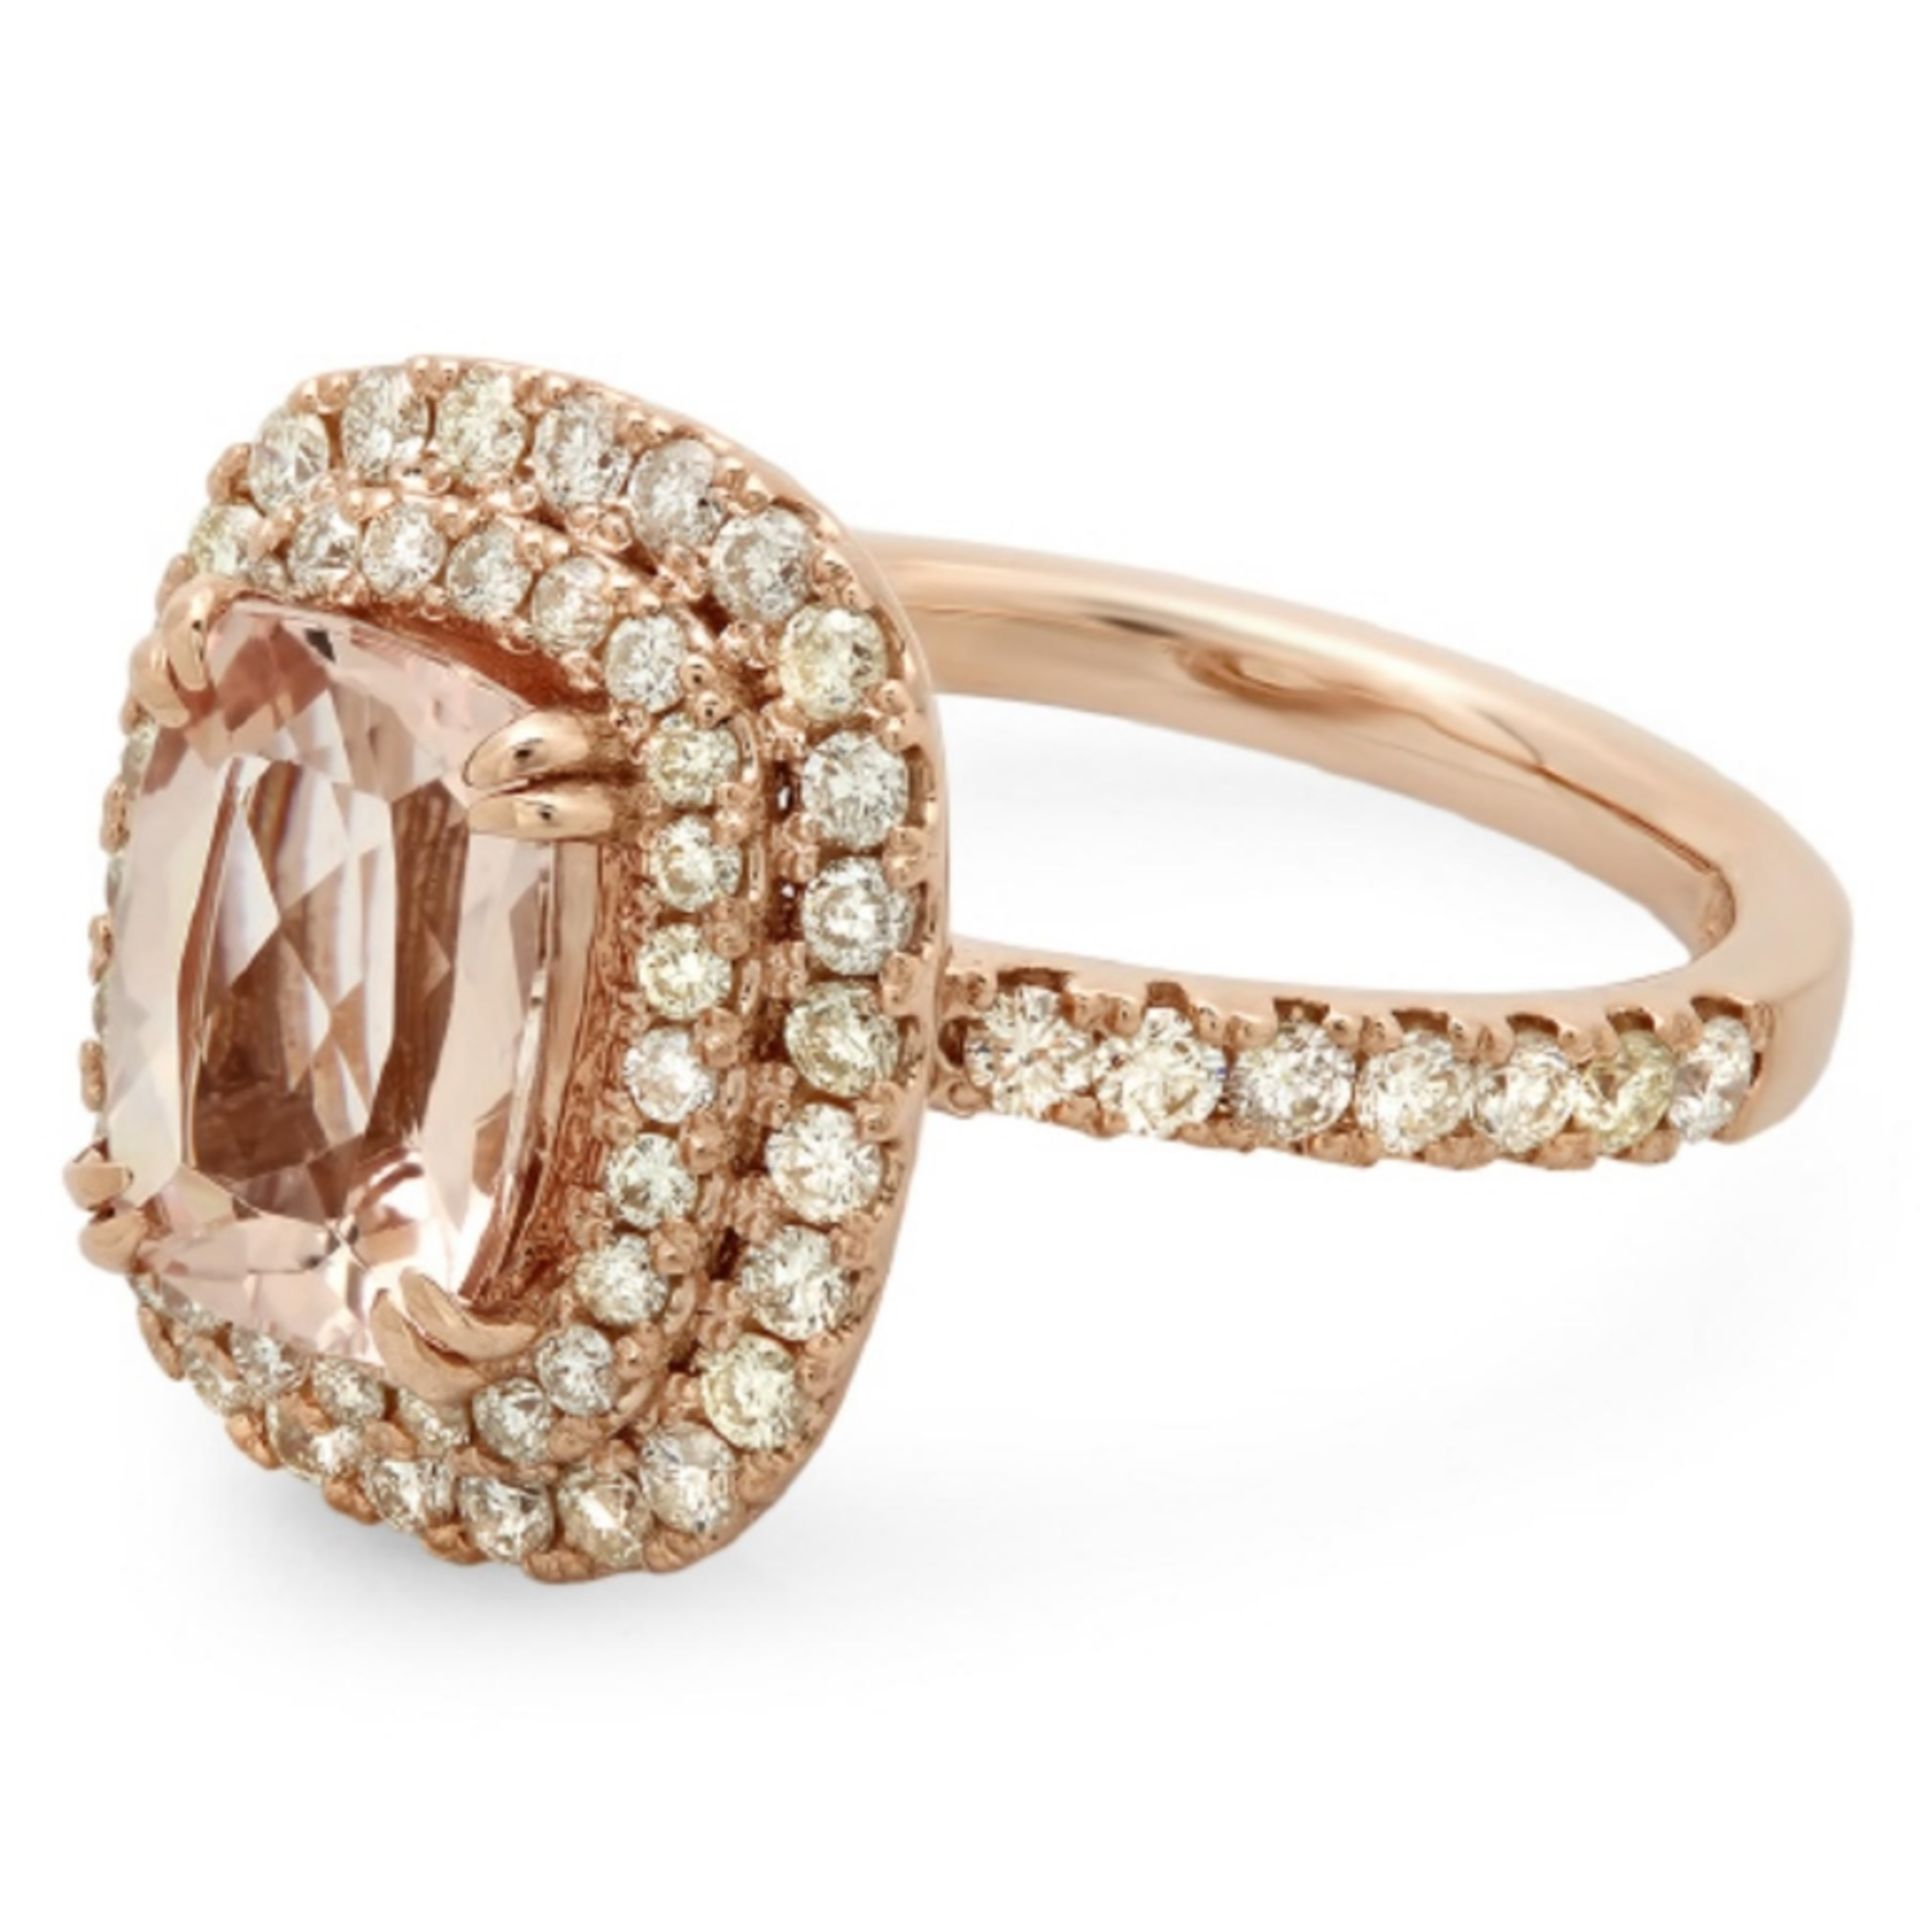 14K Gold 2.00ct Morganite & 1.00ct Diamond Ring - Image 2 of 2